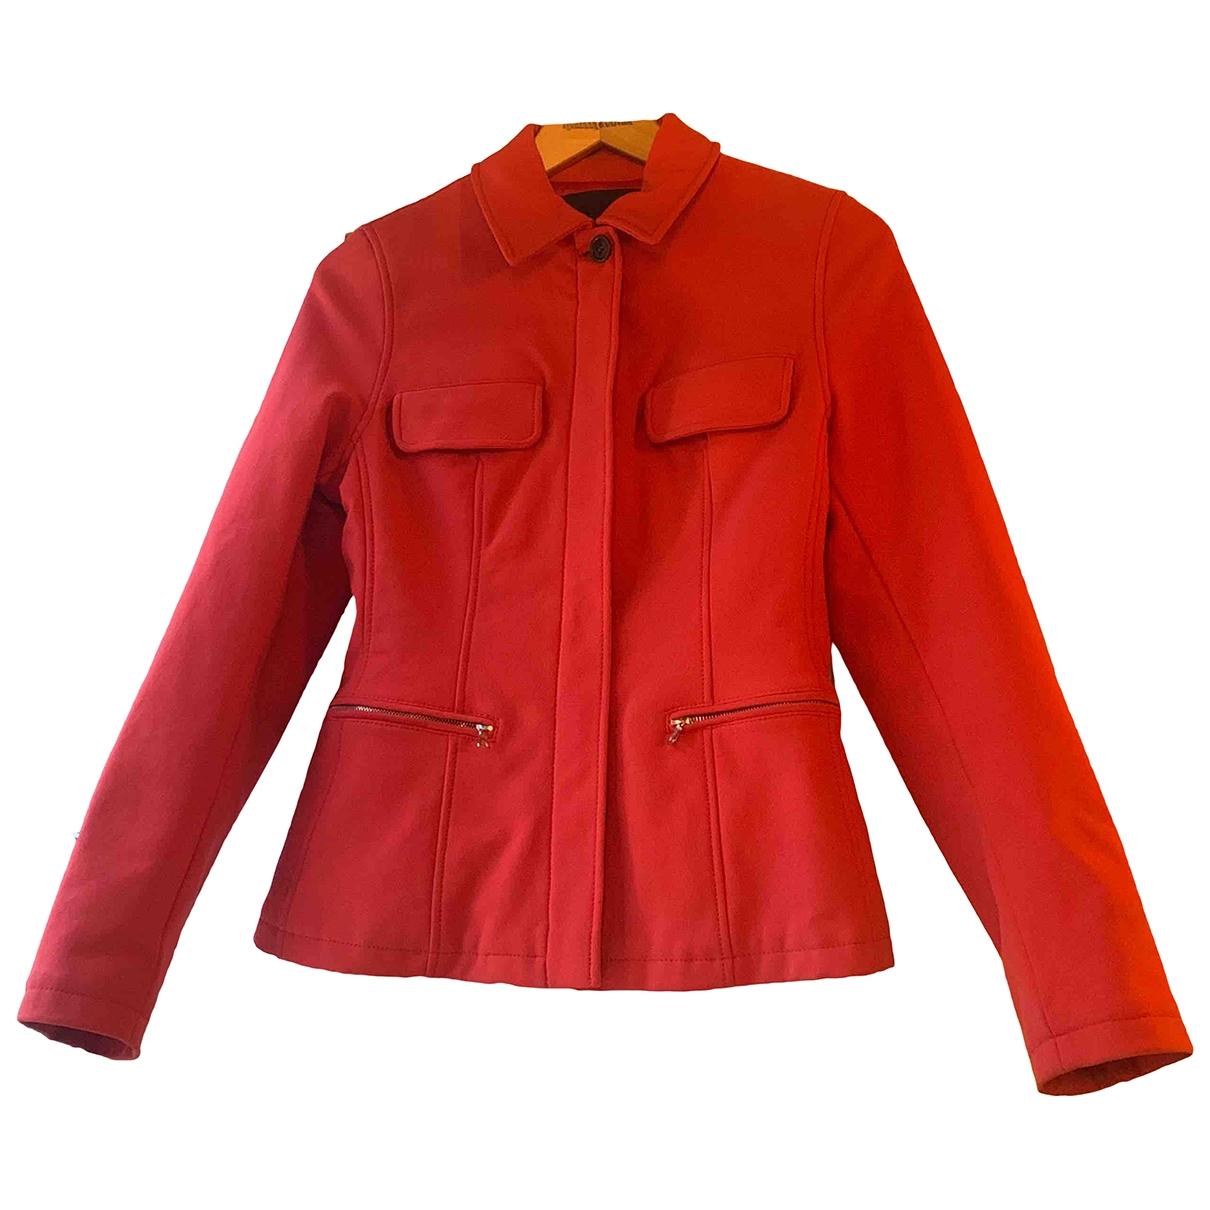 Prada \N Red jacket for Women 42 IT